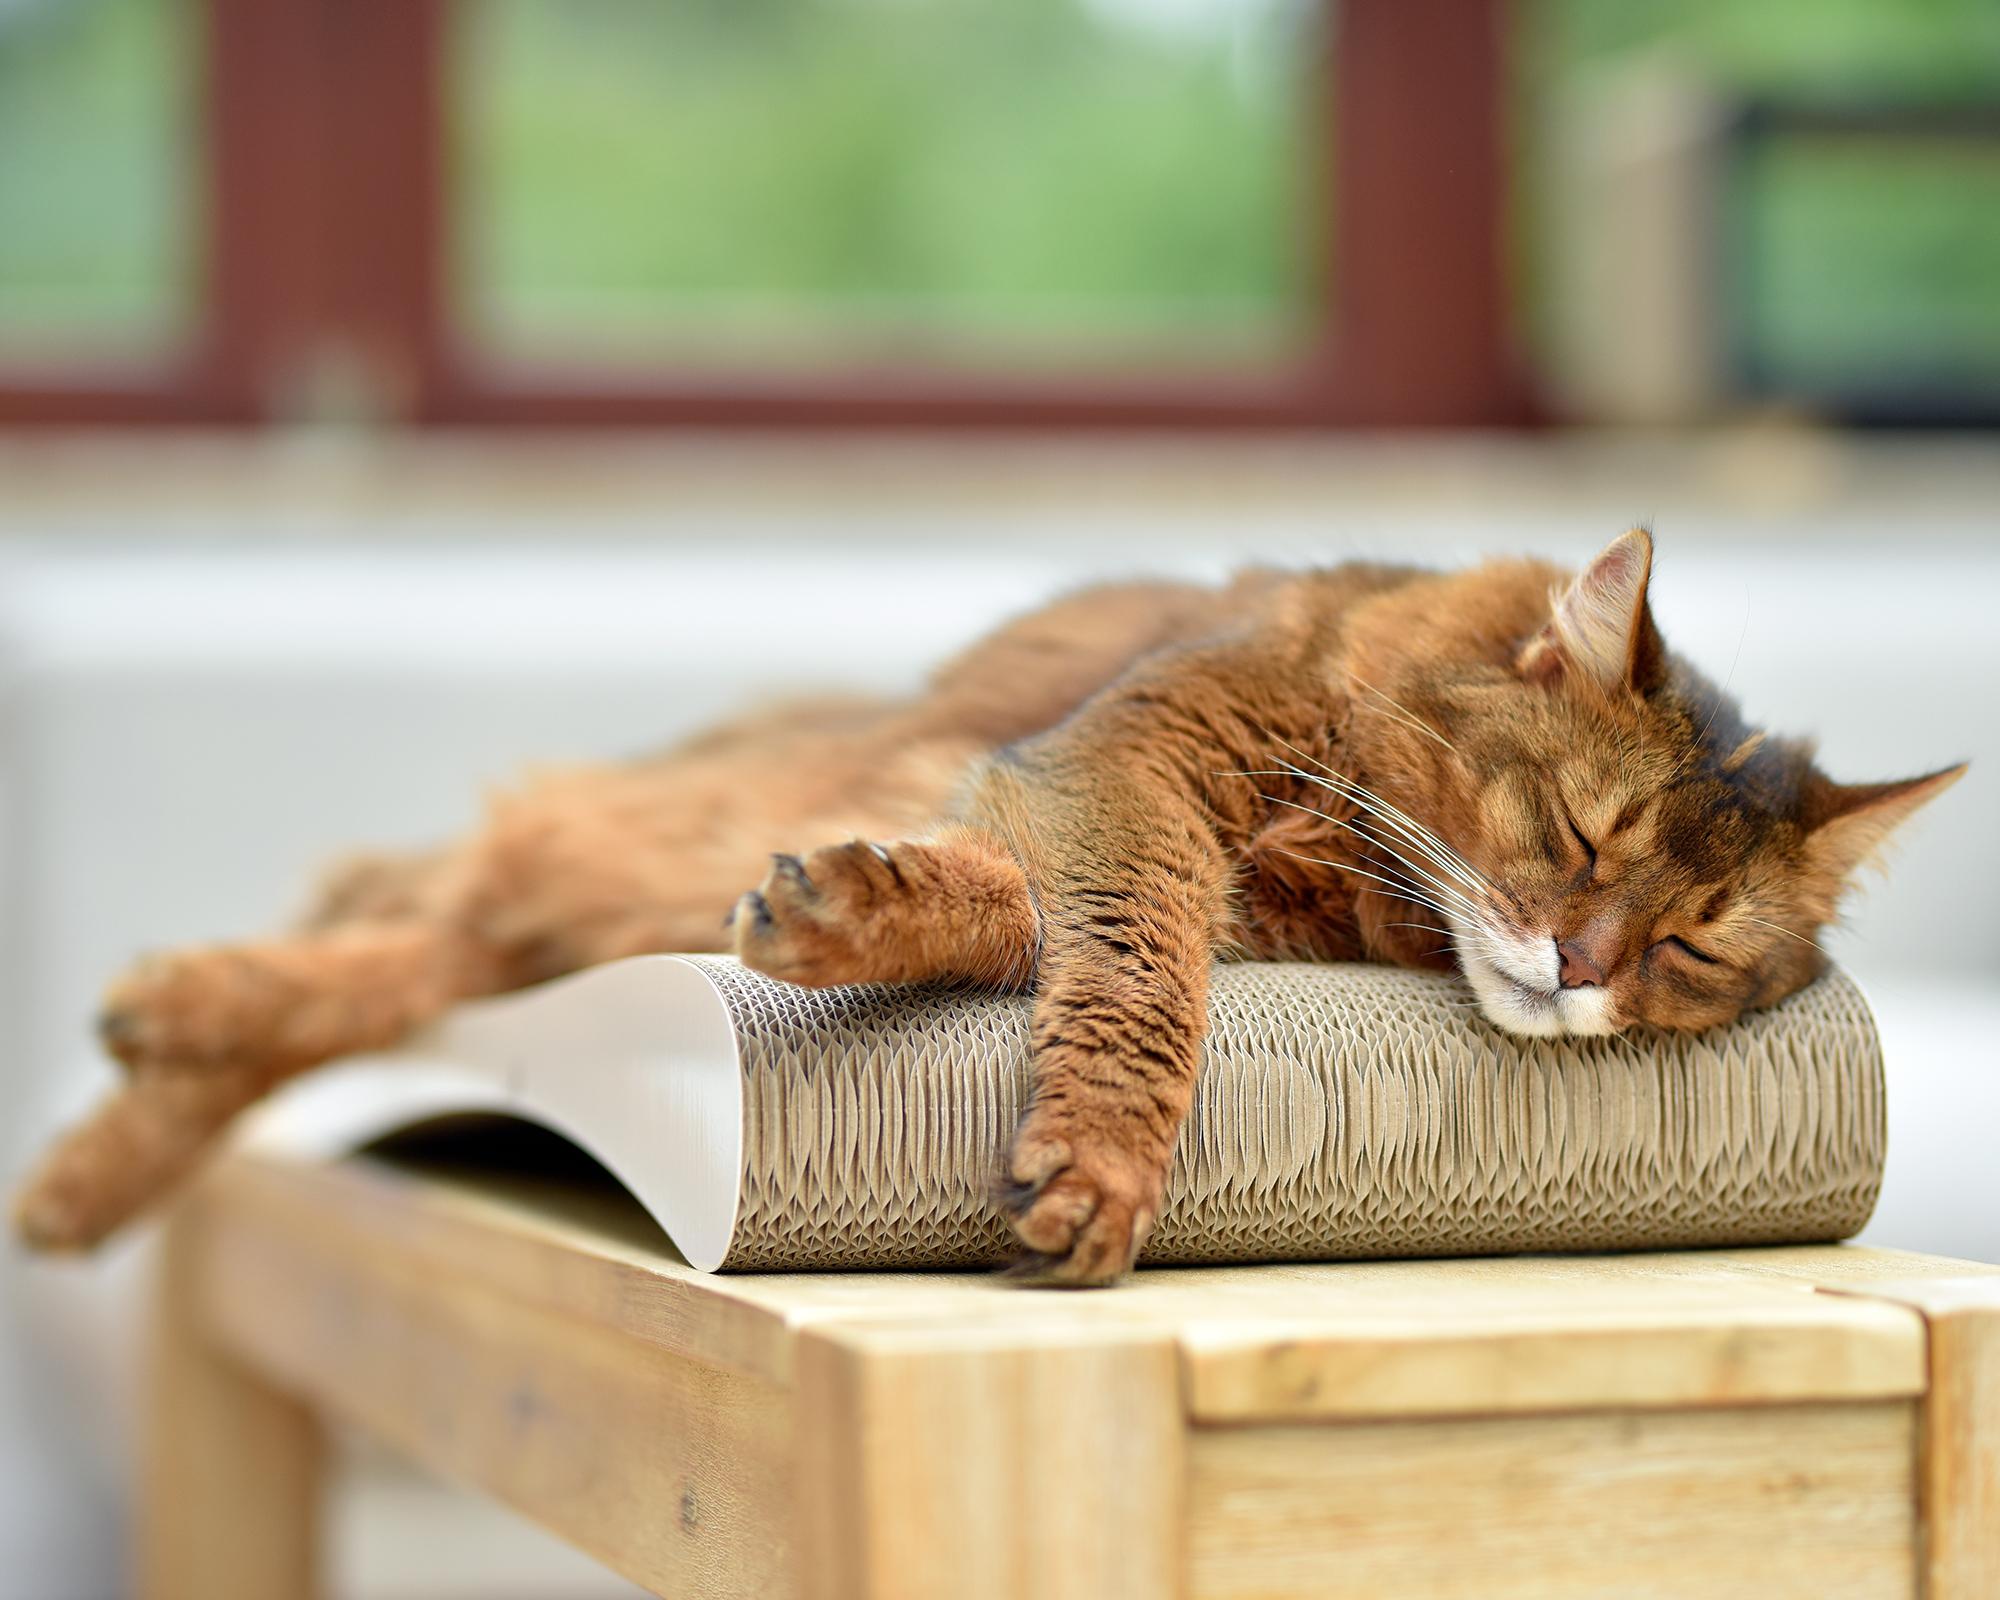 Grattoir Slim Line design cat scratcher